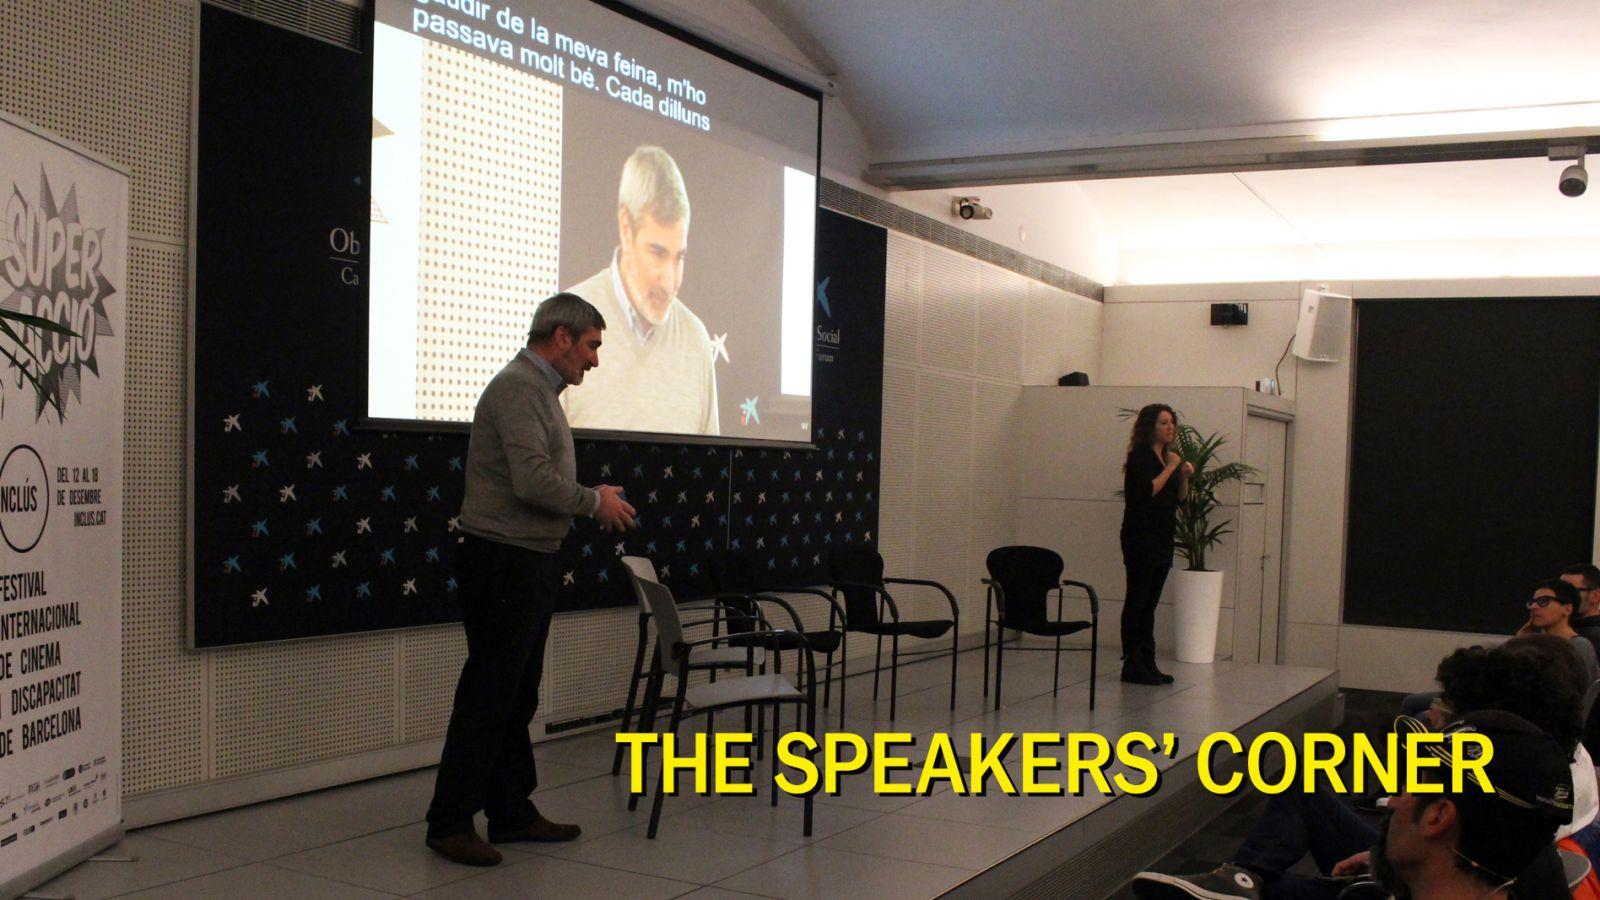 The speakers' corner